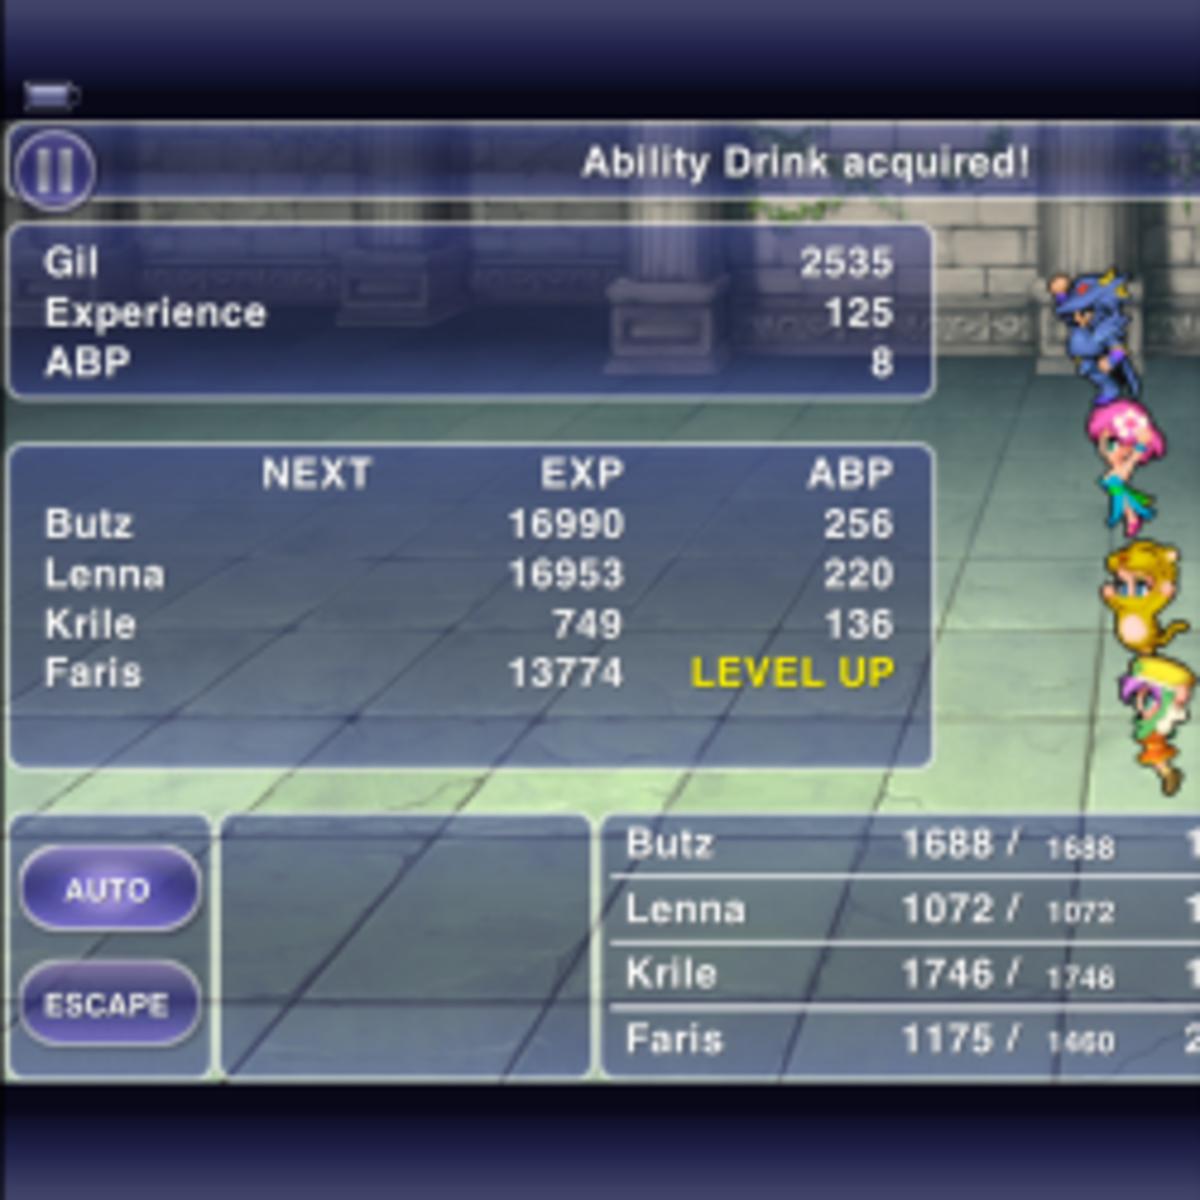 Final Fantasy V ABP Grinding Spots